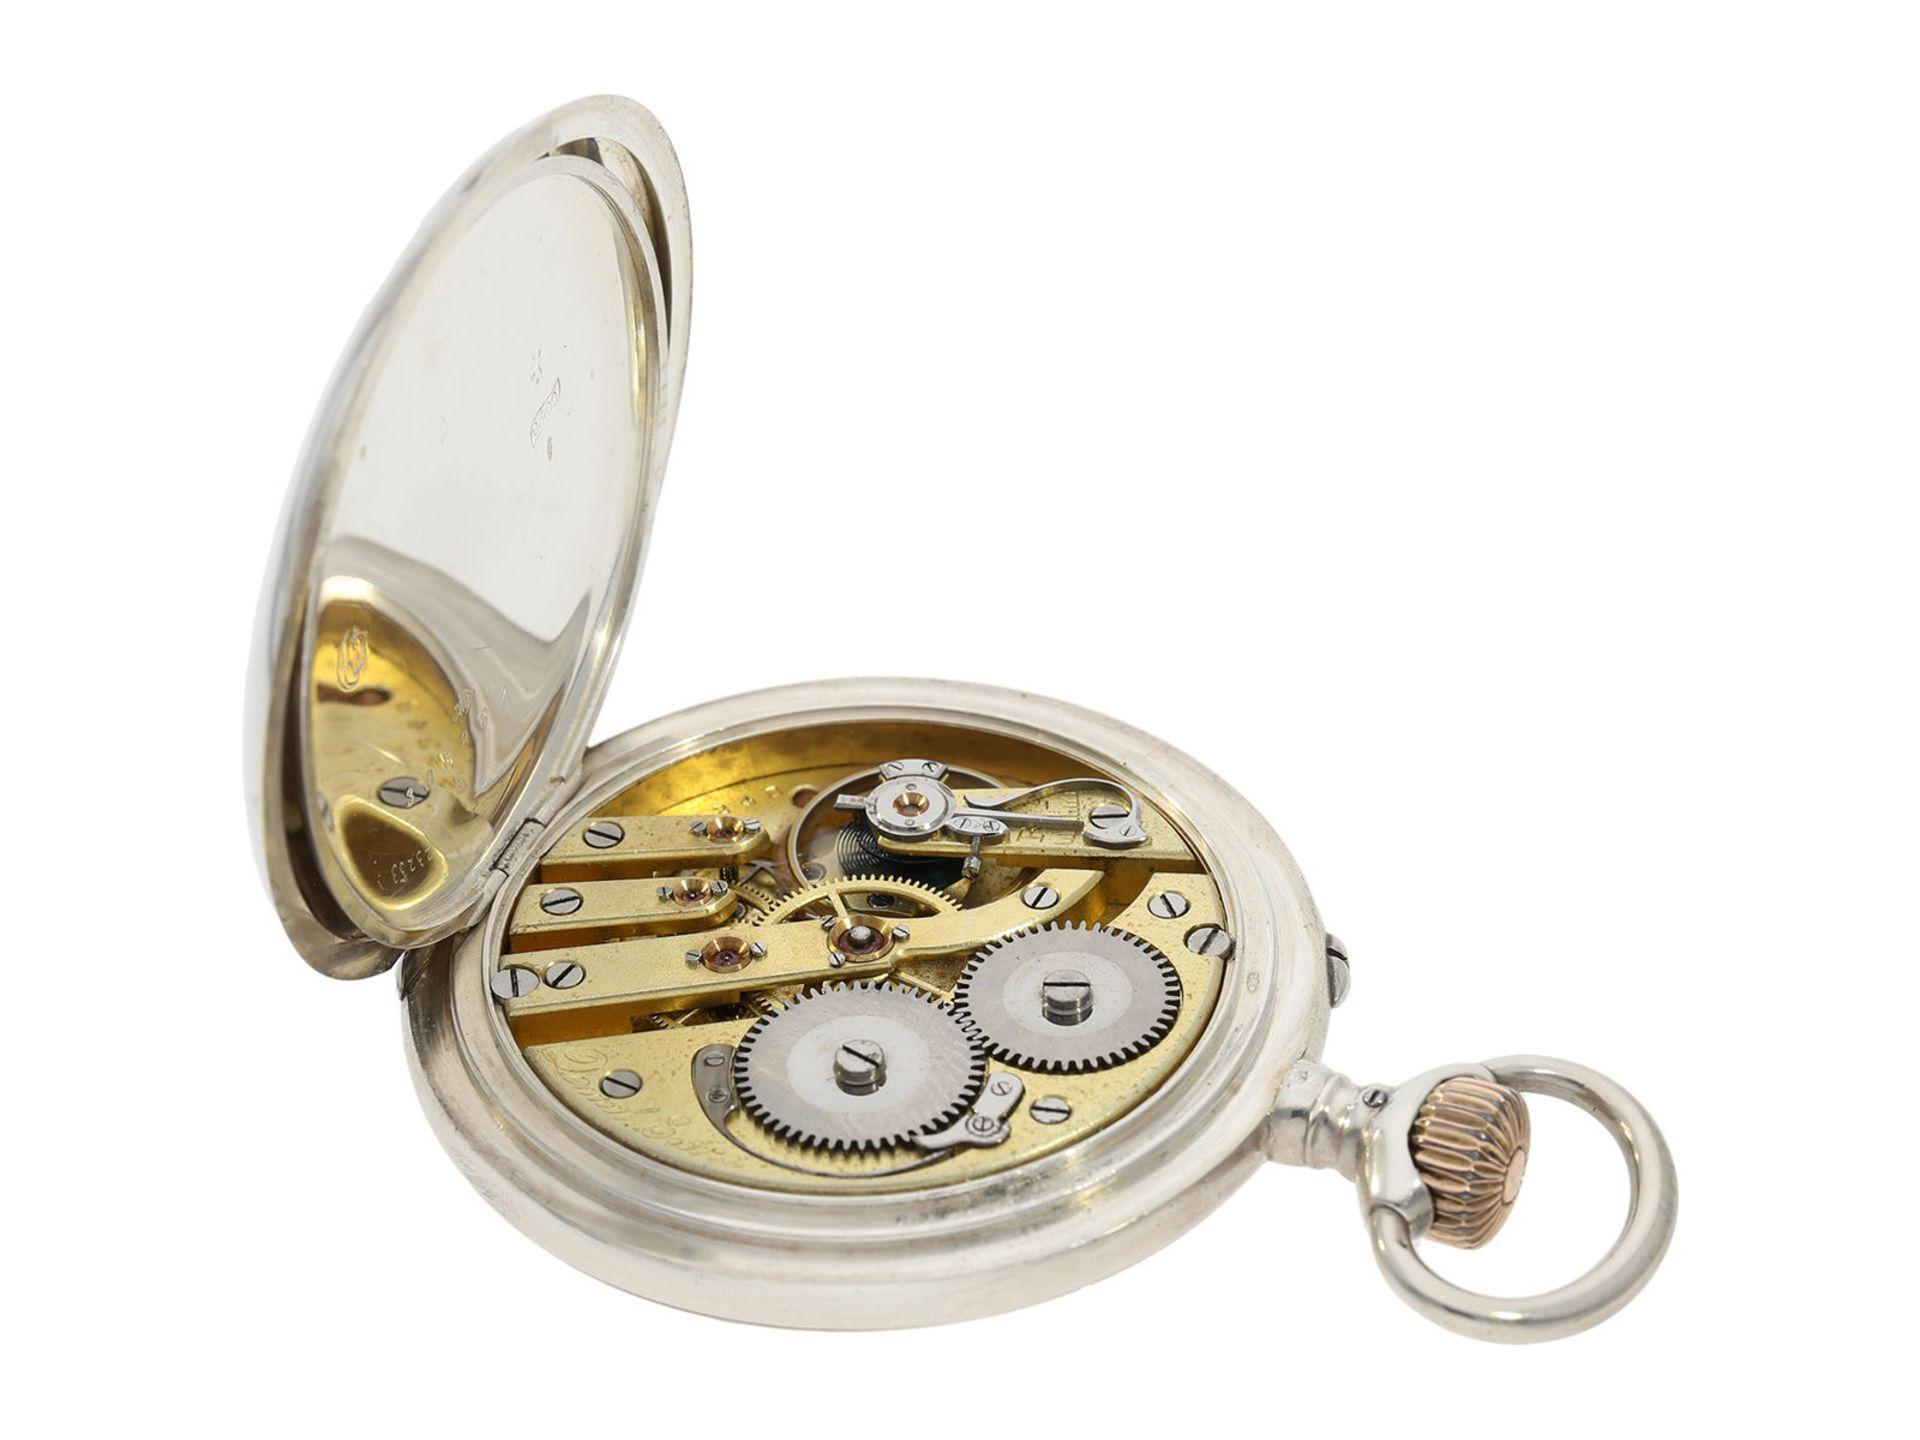 "Pocket watch: early IWC man's pocket watch rare quality ""Extra"", Schaffhausen 1902, delivered to - Bild 5 aus 6"